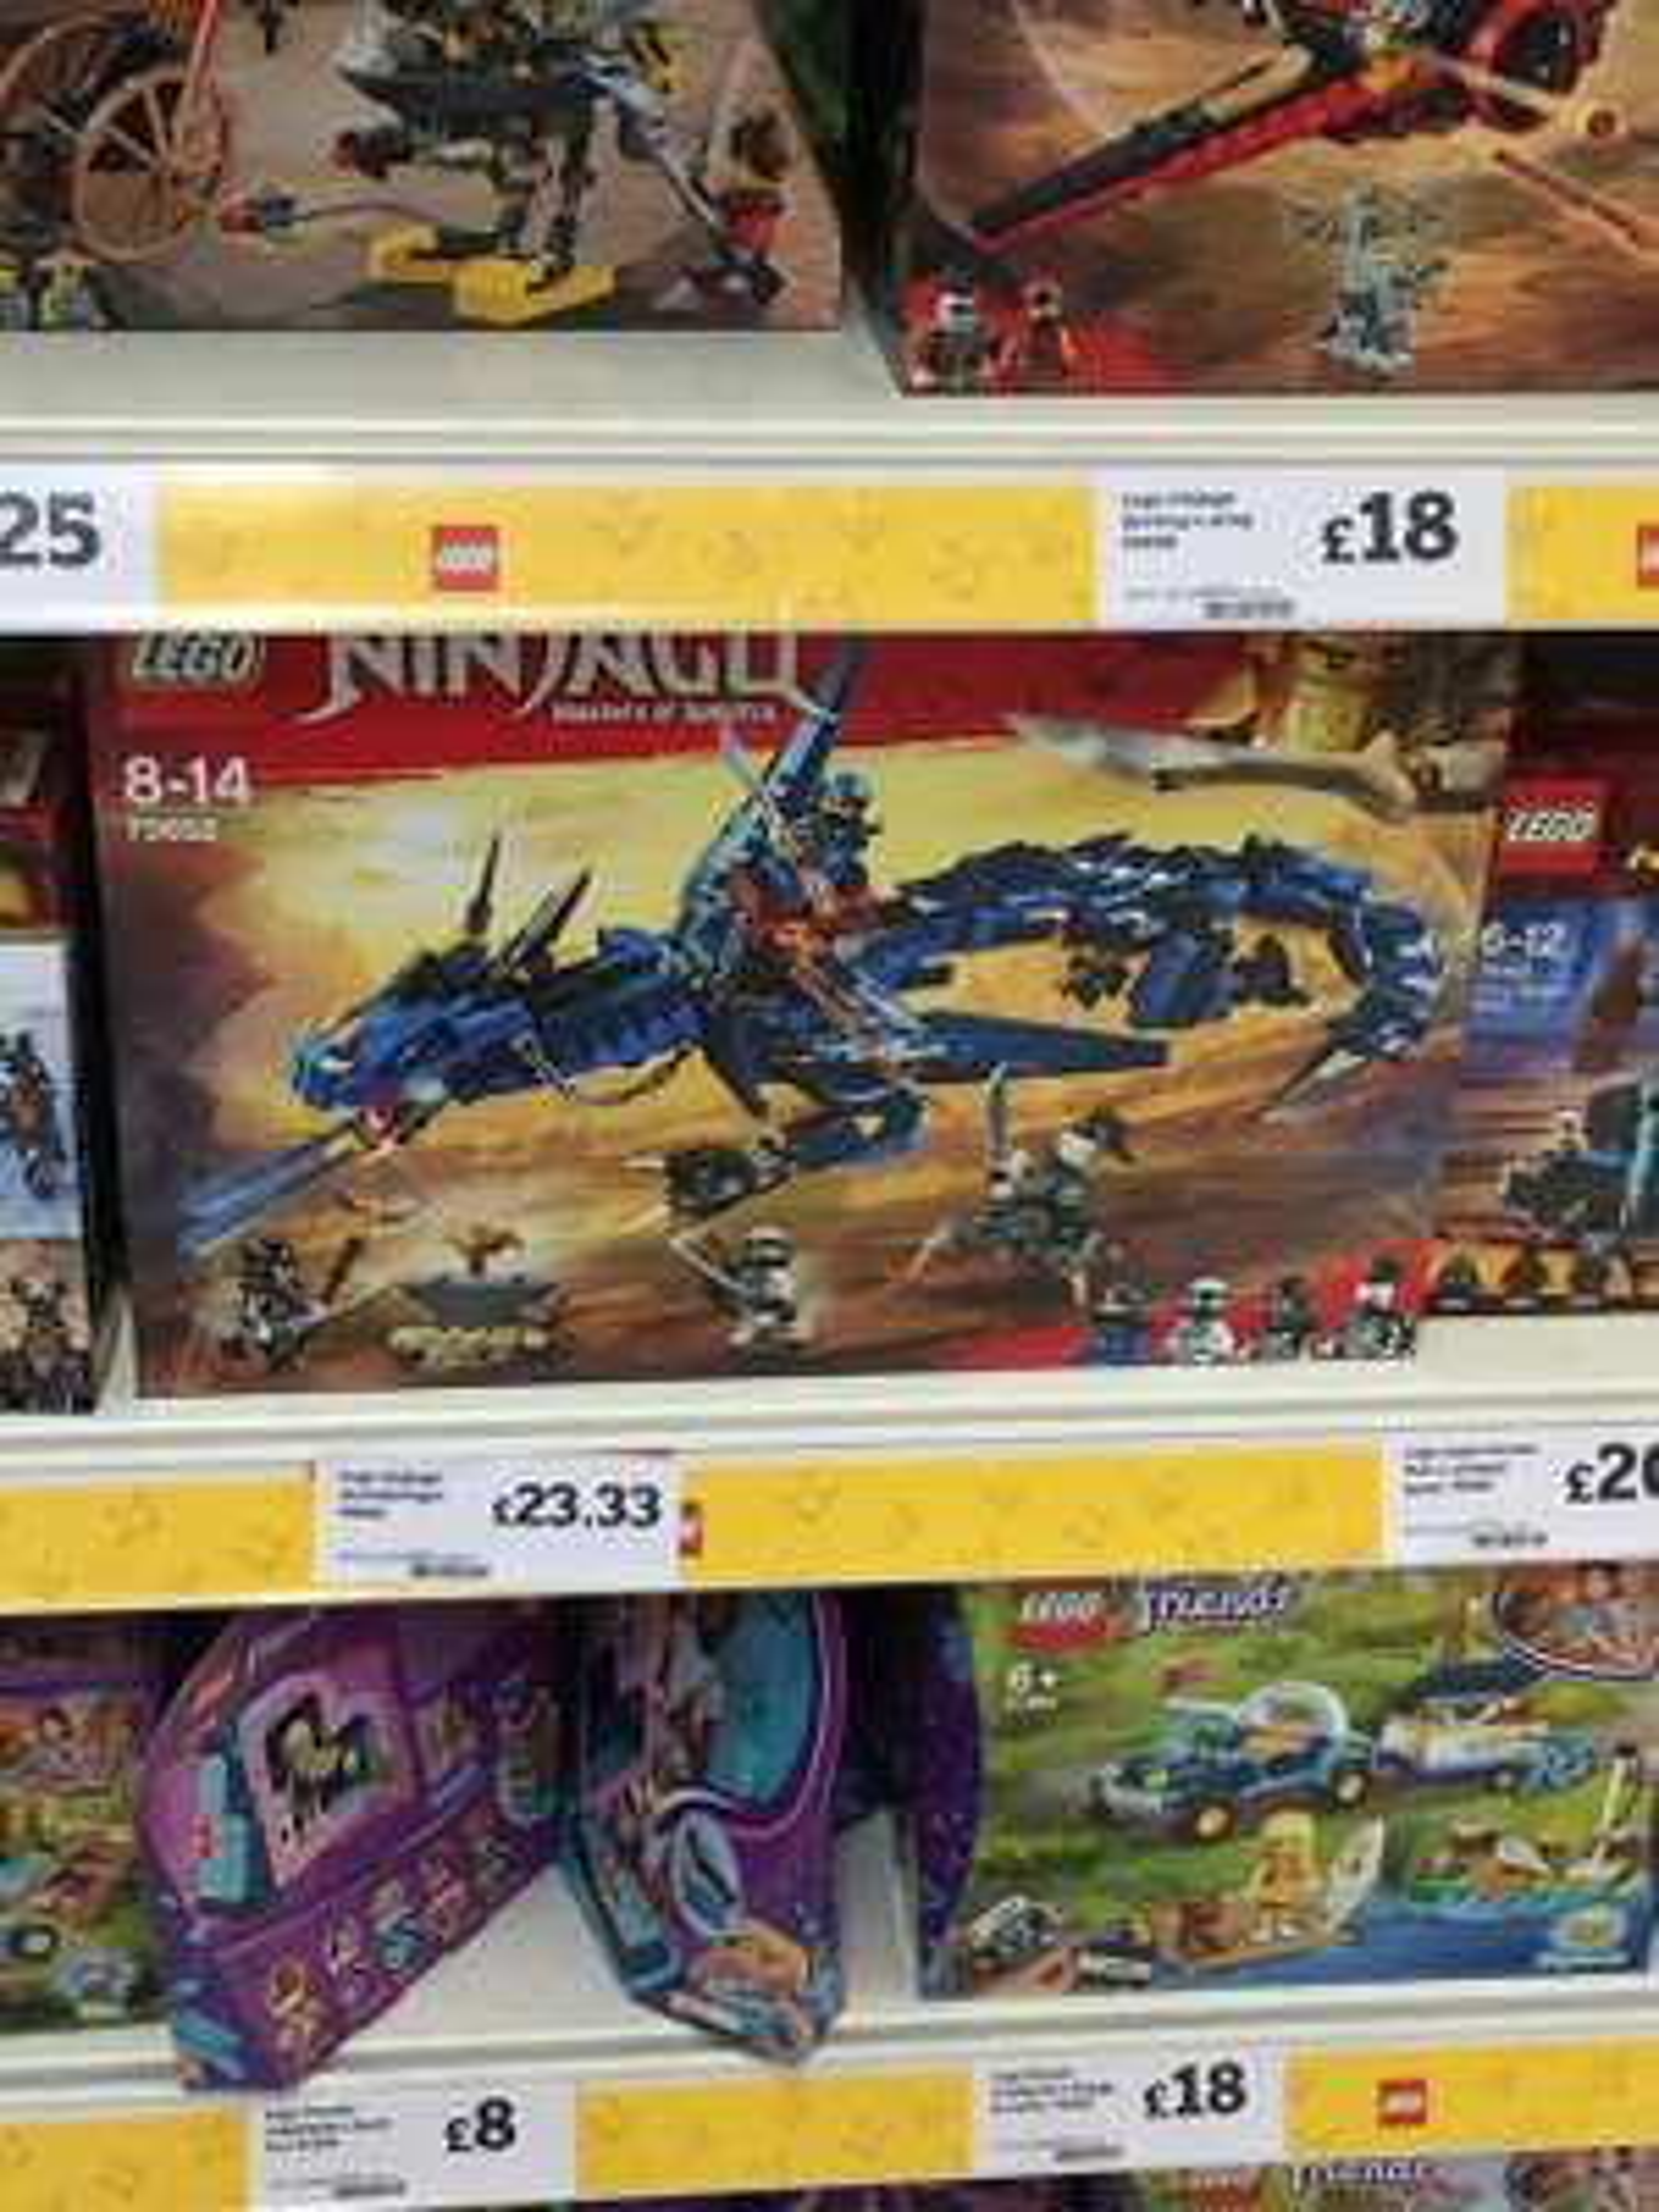 Lego Ninjago Stormbringer Dragon Blue 70652 - Sainsburys - £23.33